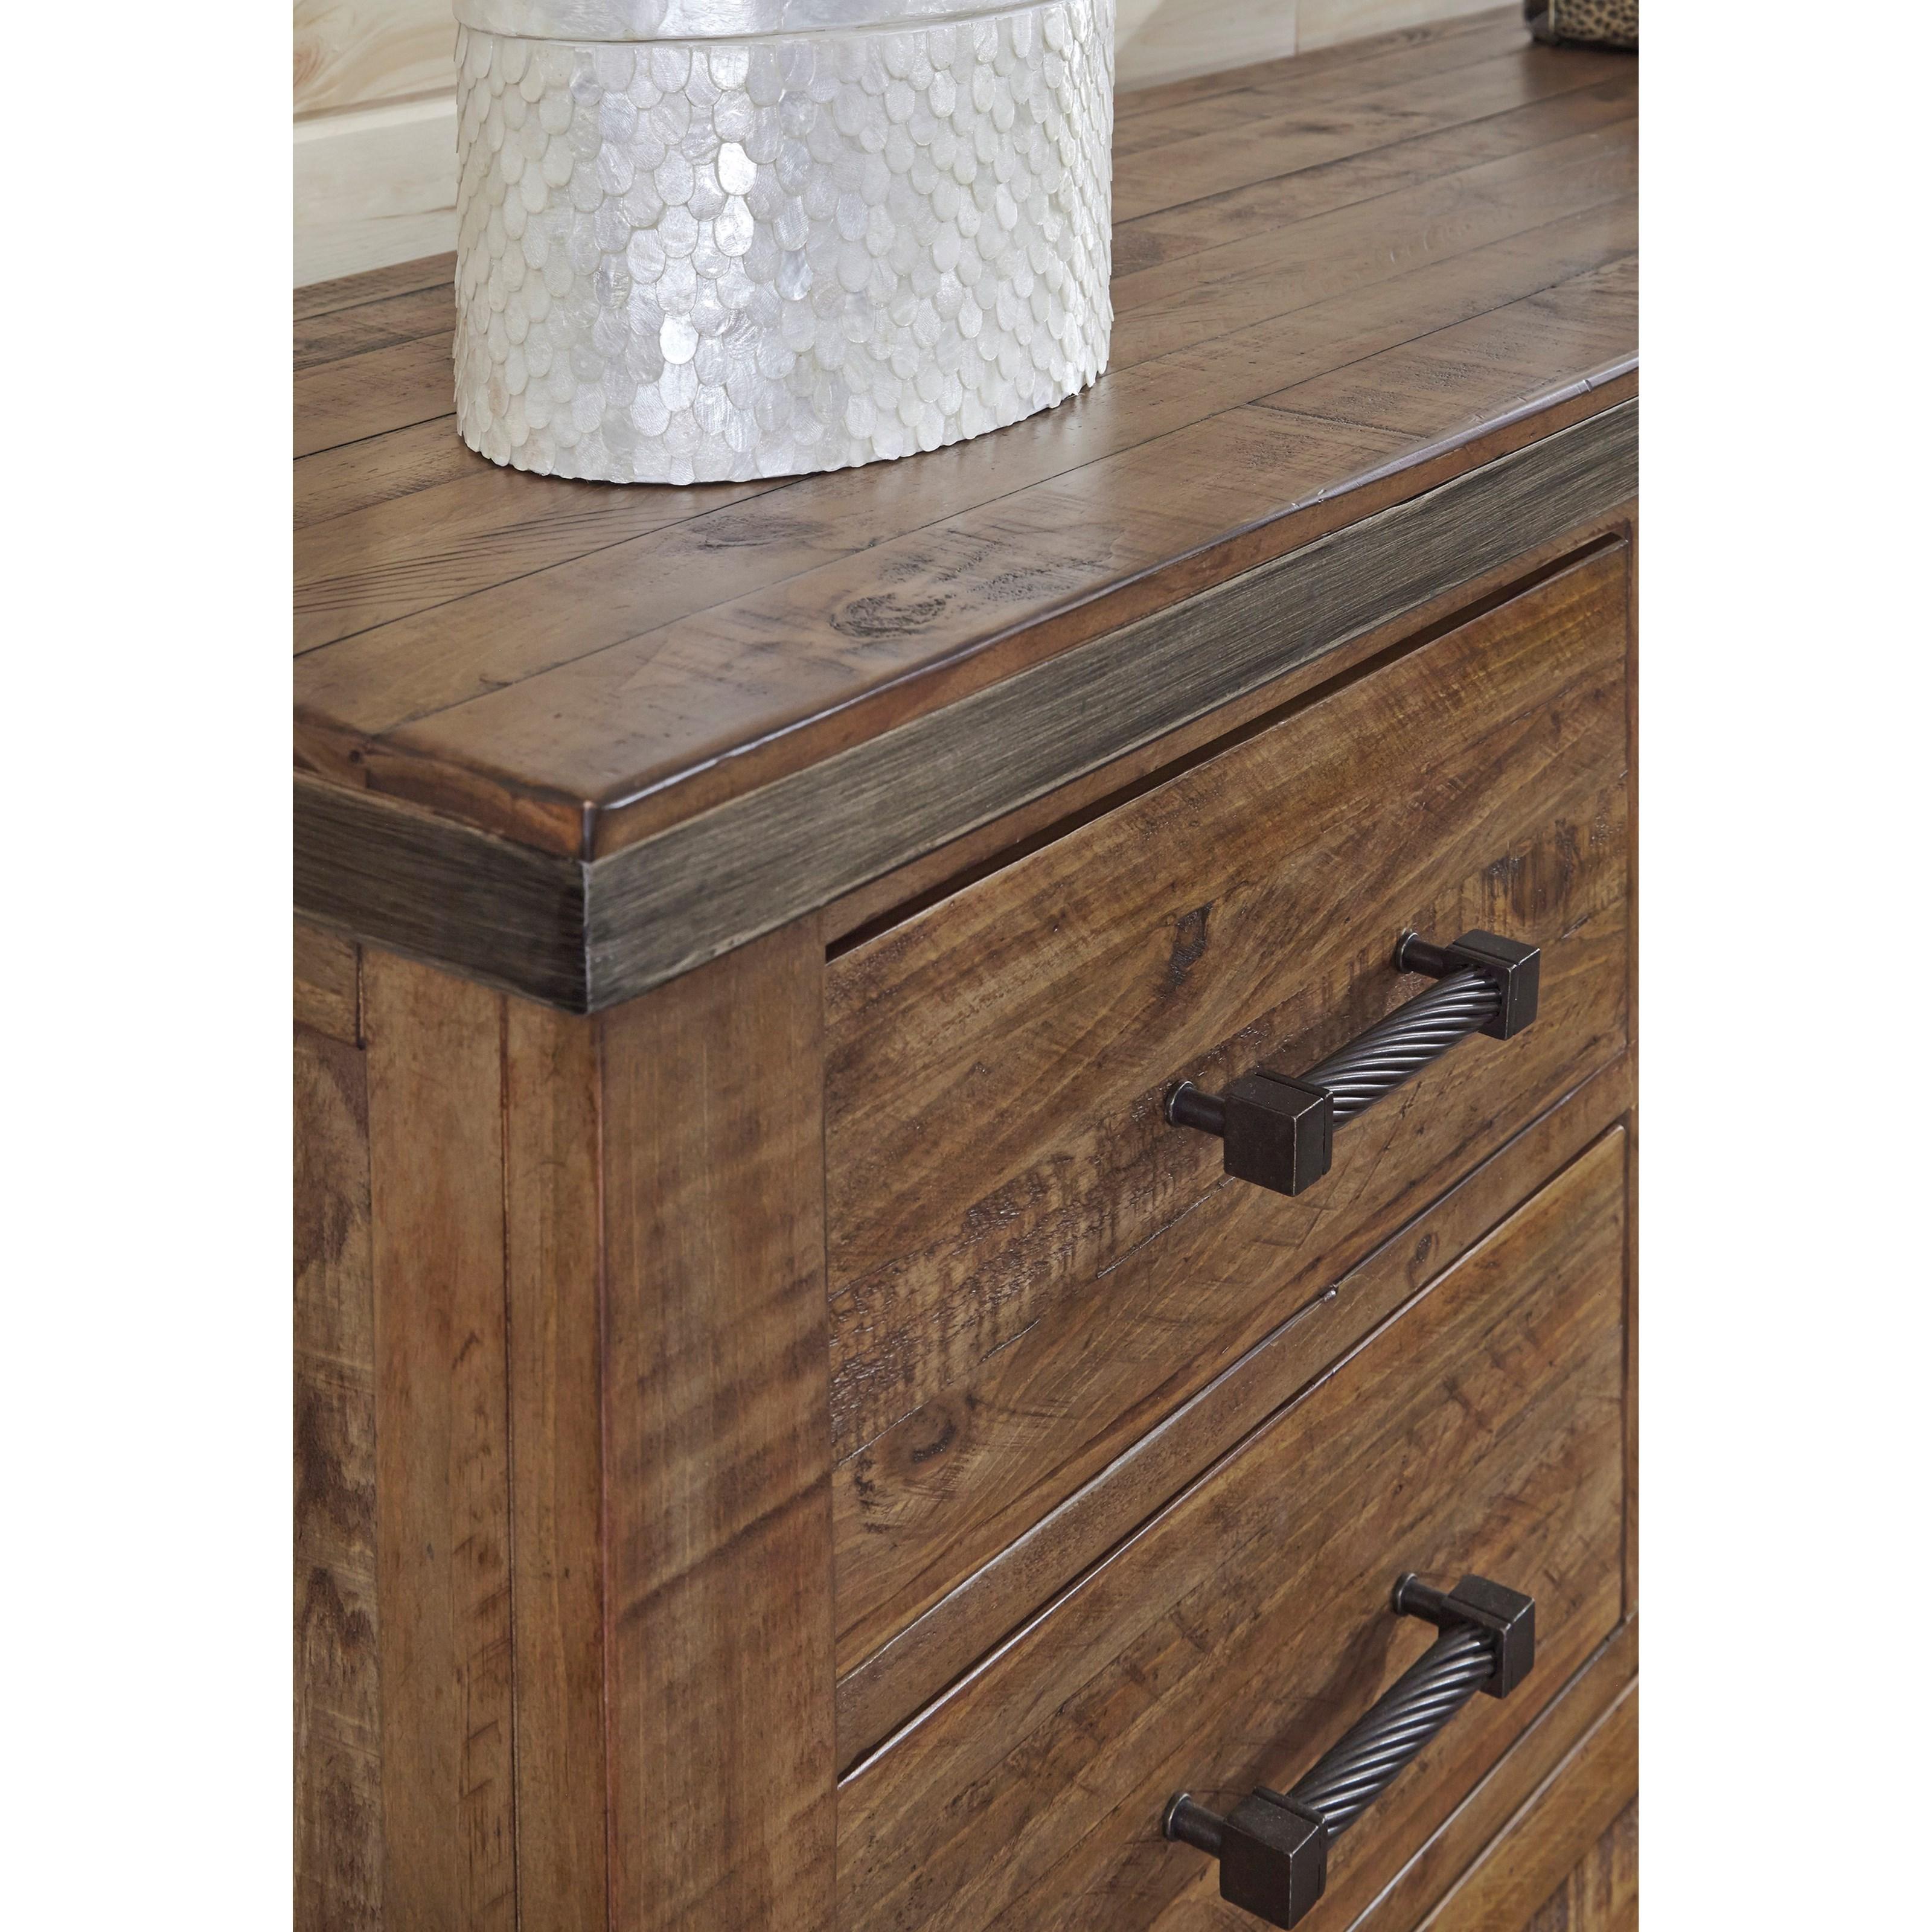 Modern Rustic Solid Wood Dresser With Metal Legs And Metal Banding